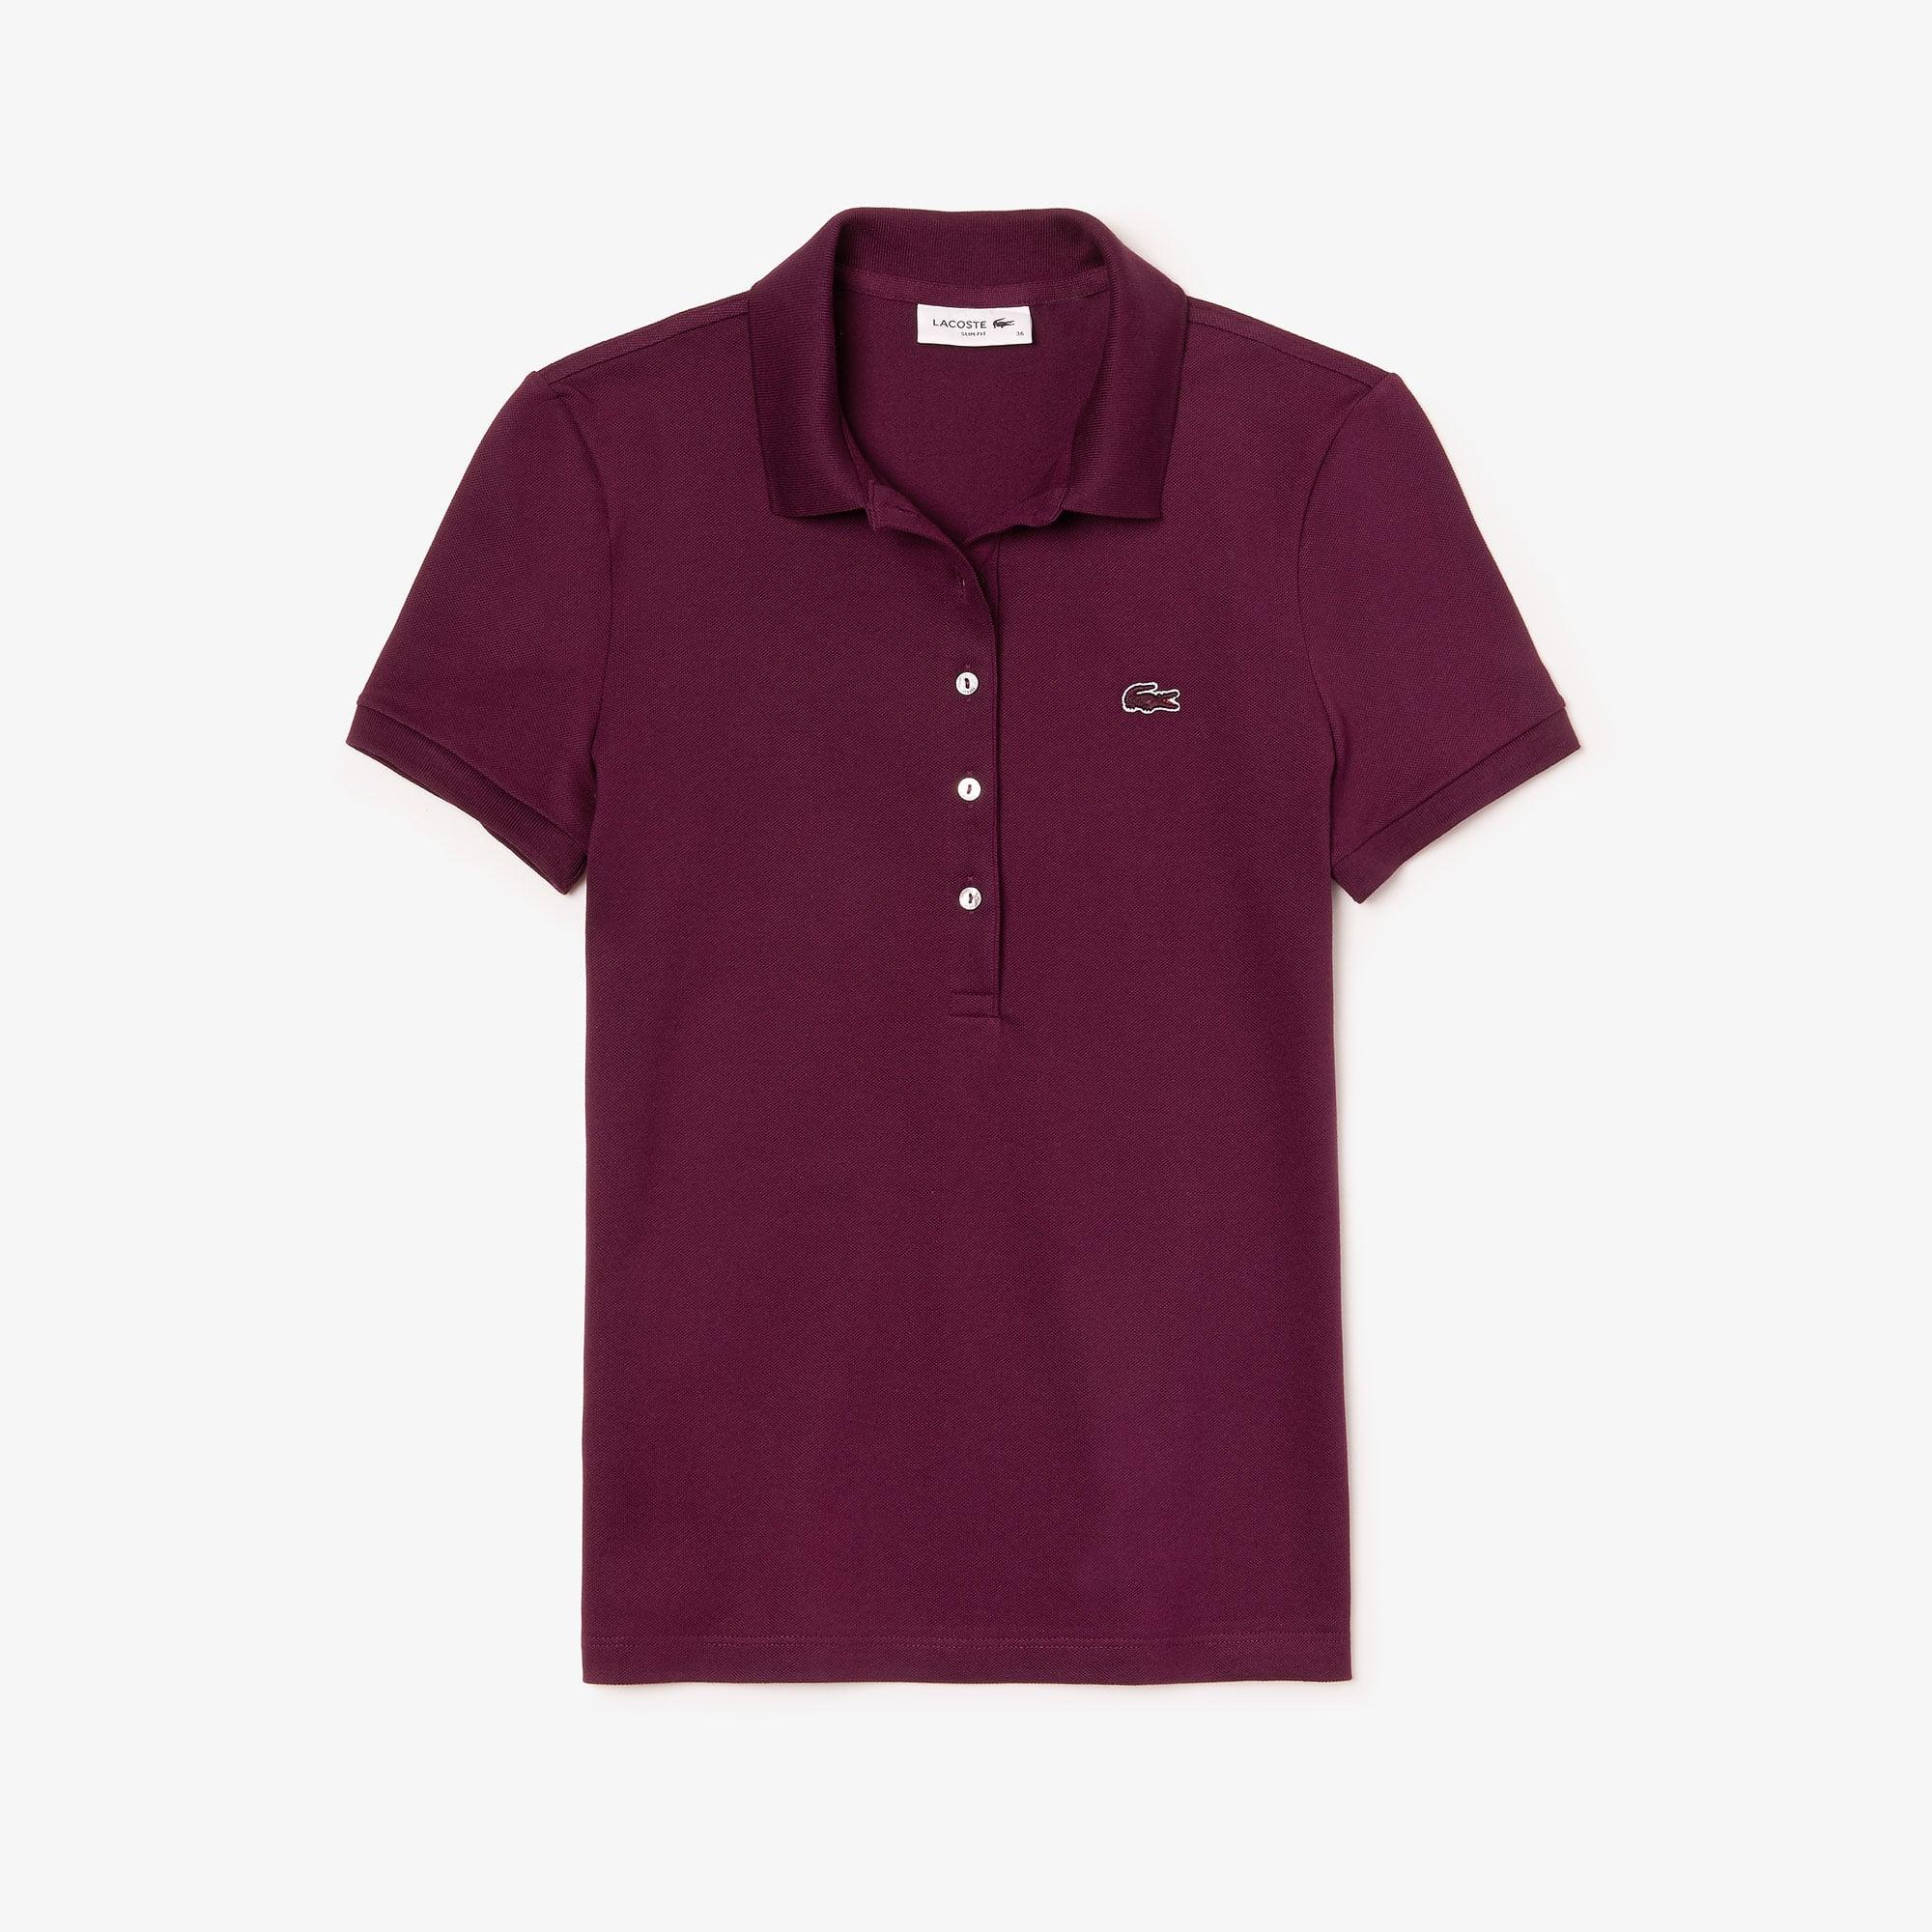 88a75d4a85967e Polos, Kleidung und Lederwaren Online   LACOSTE